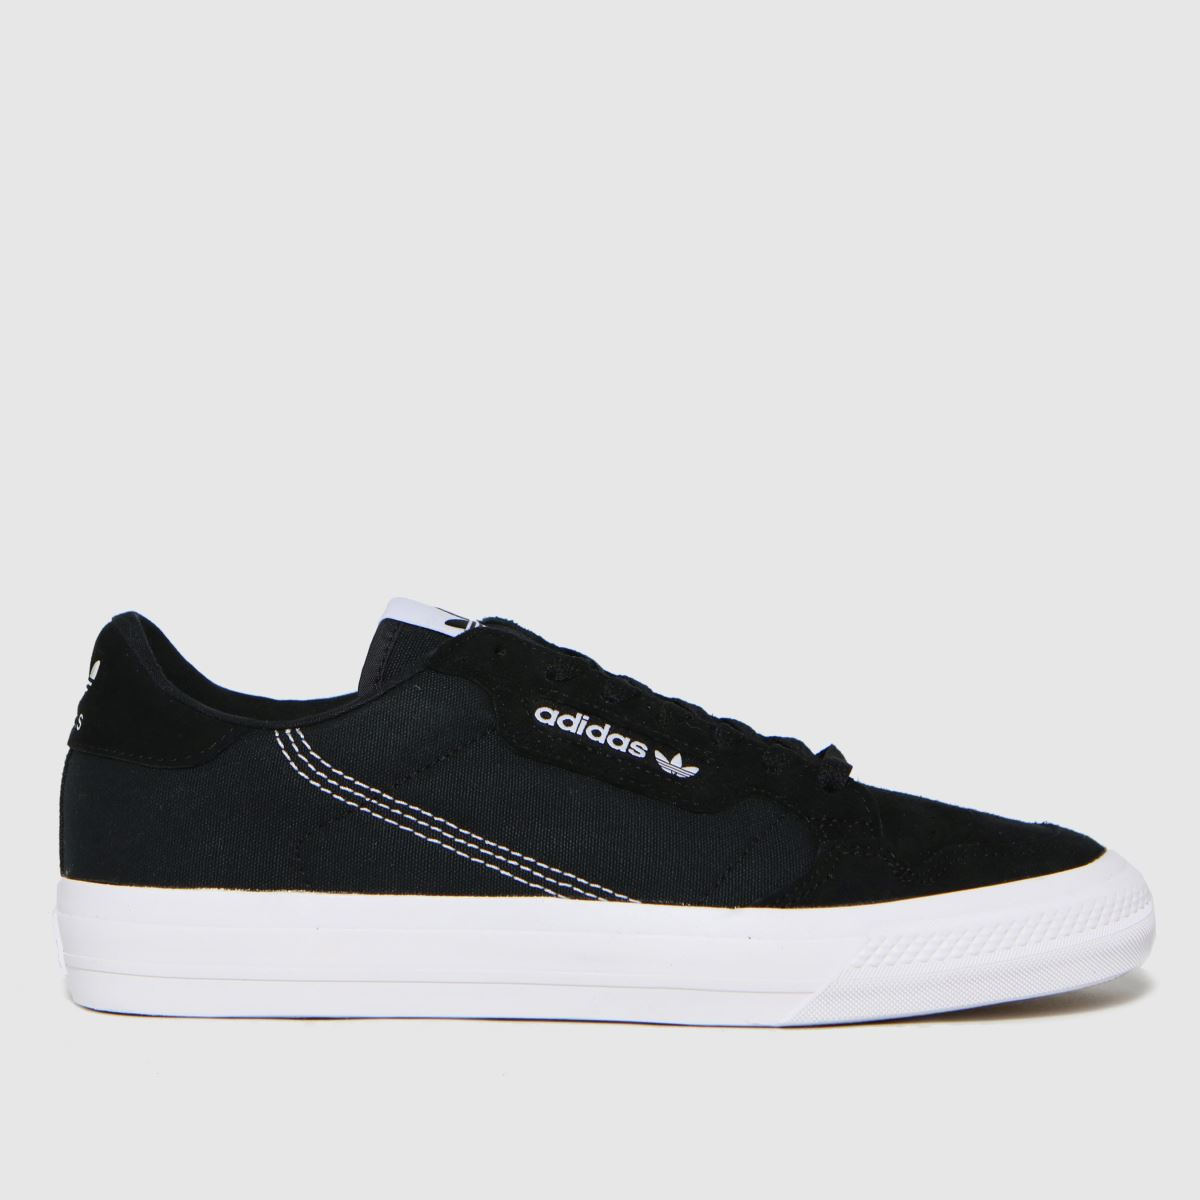 Adidas Black & White Continental Vulc Trainers